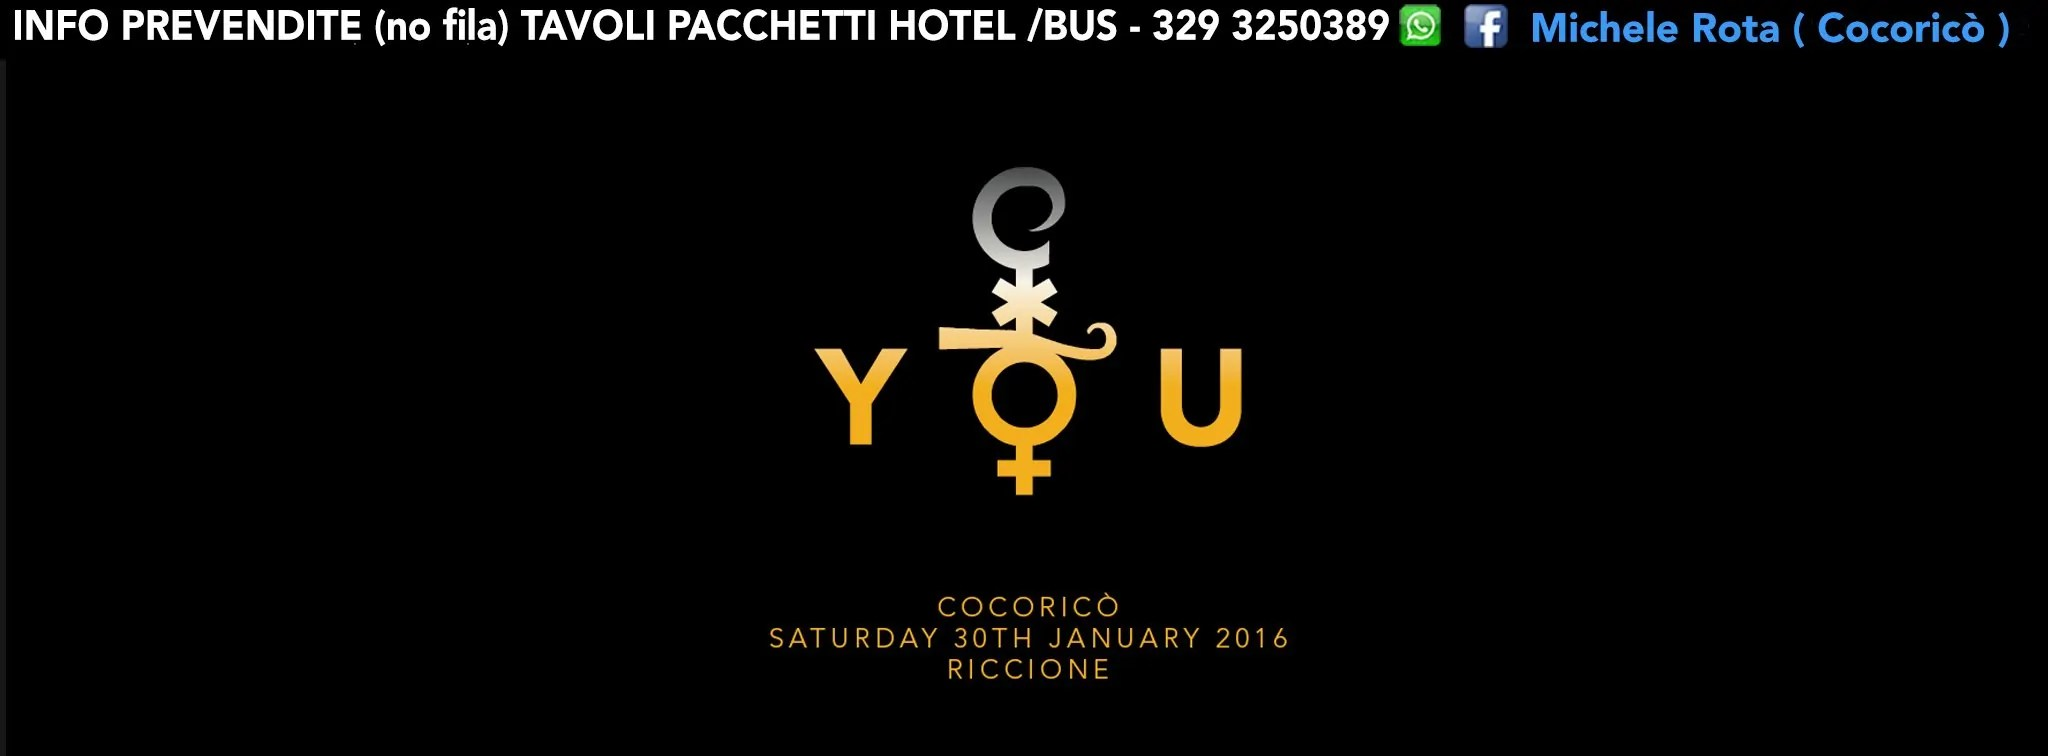 Cocorico Re Opening 30 01 2016